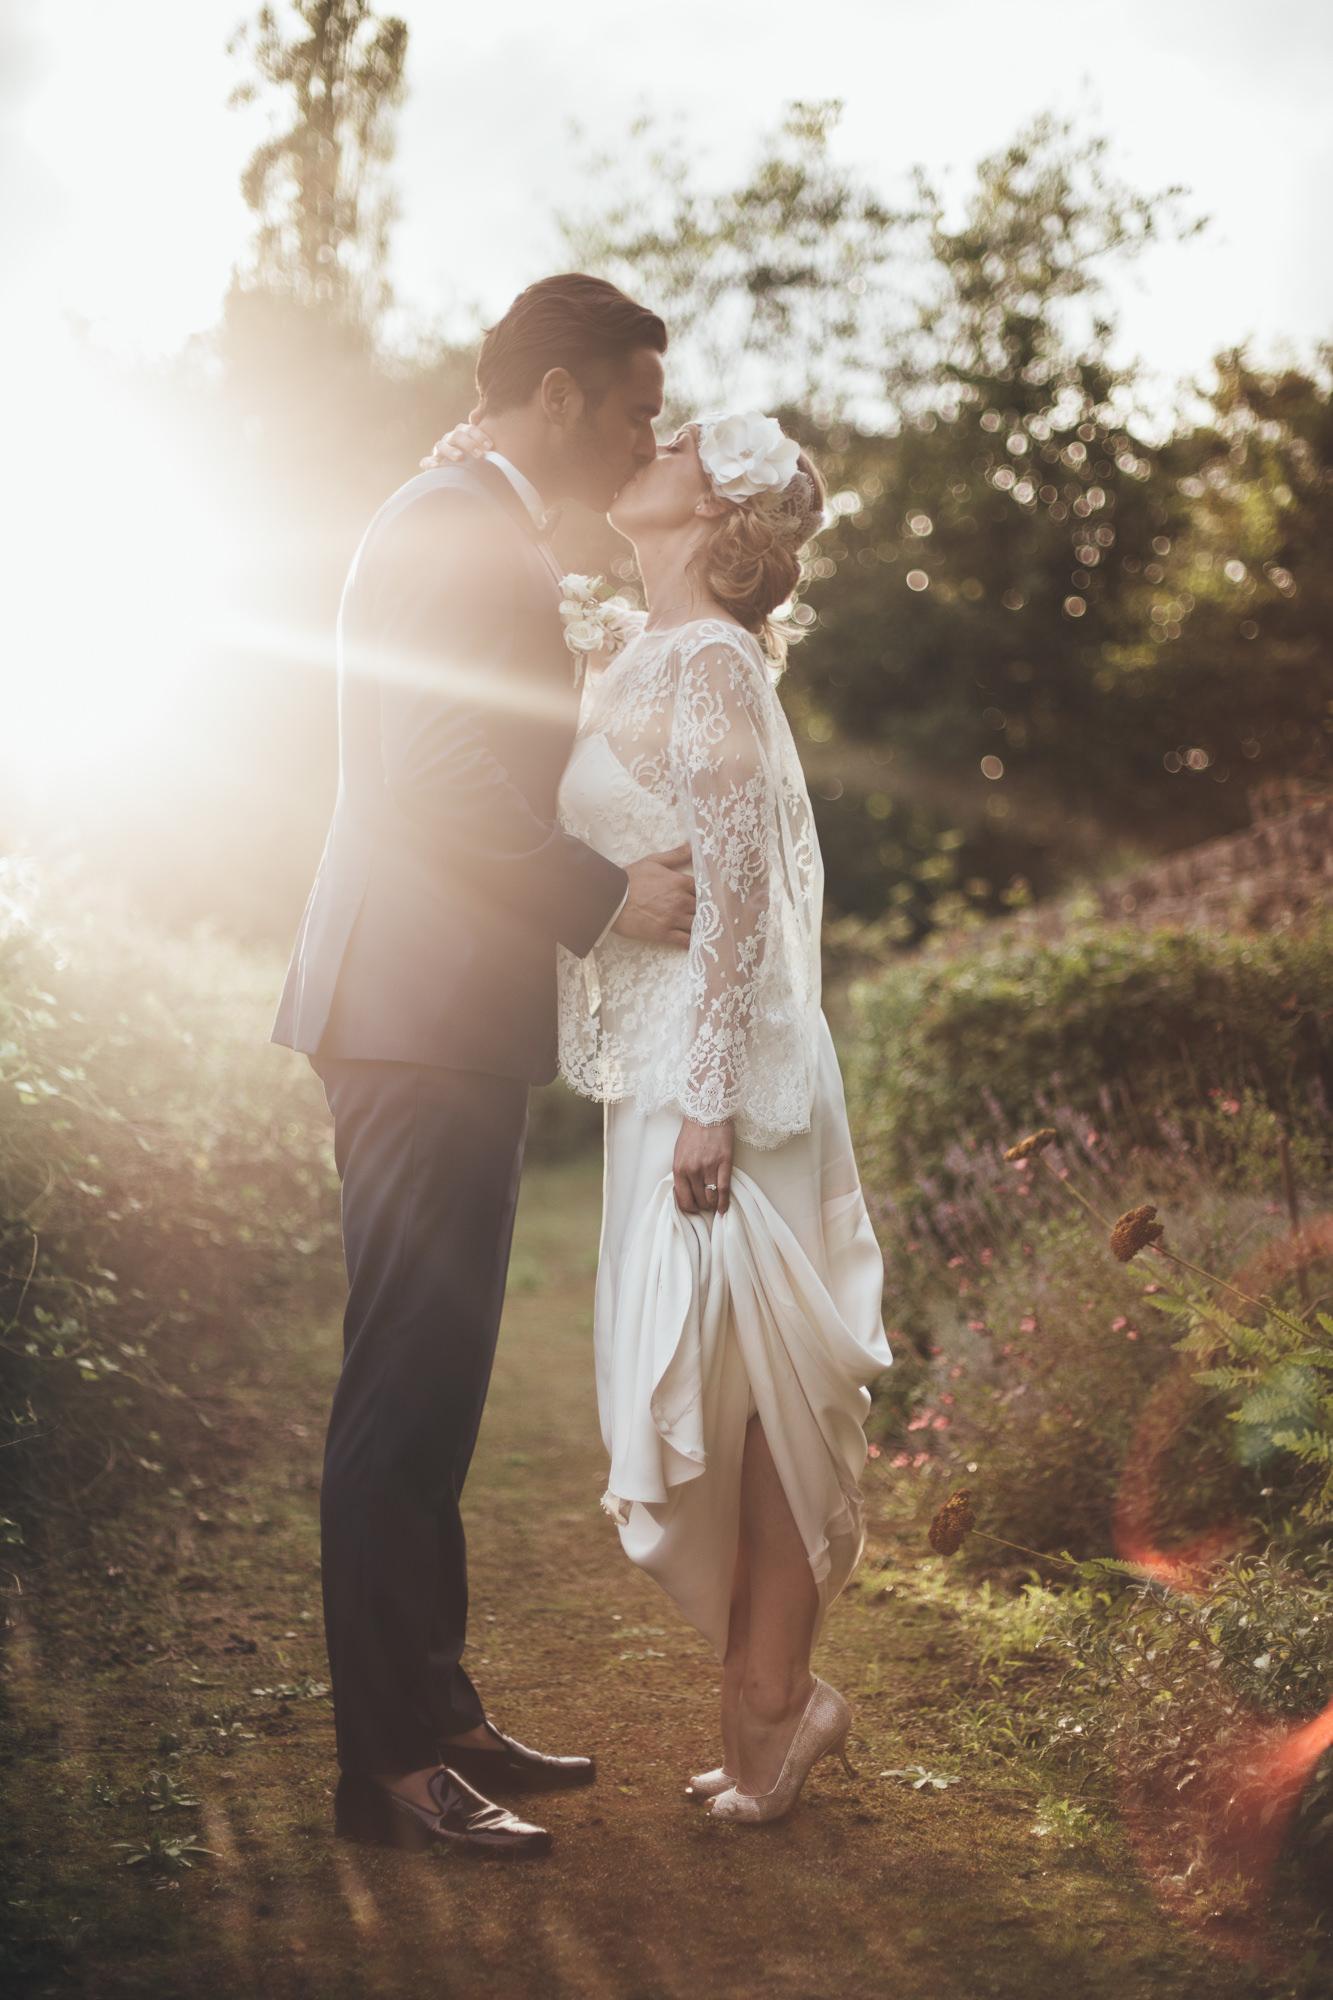 wedding-photographer-dordogne-photographe-mariageCC-SShooter-steven-bassilieaux-stevenbassilieauxphoto.com-2.jpg